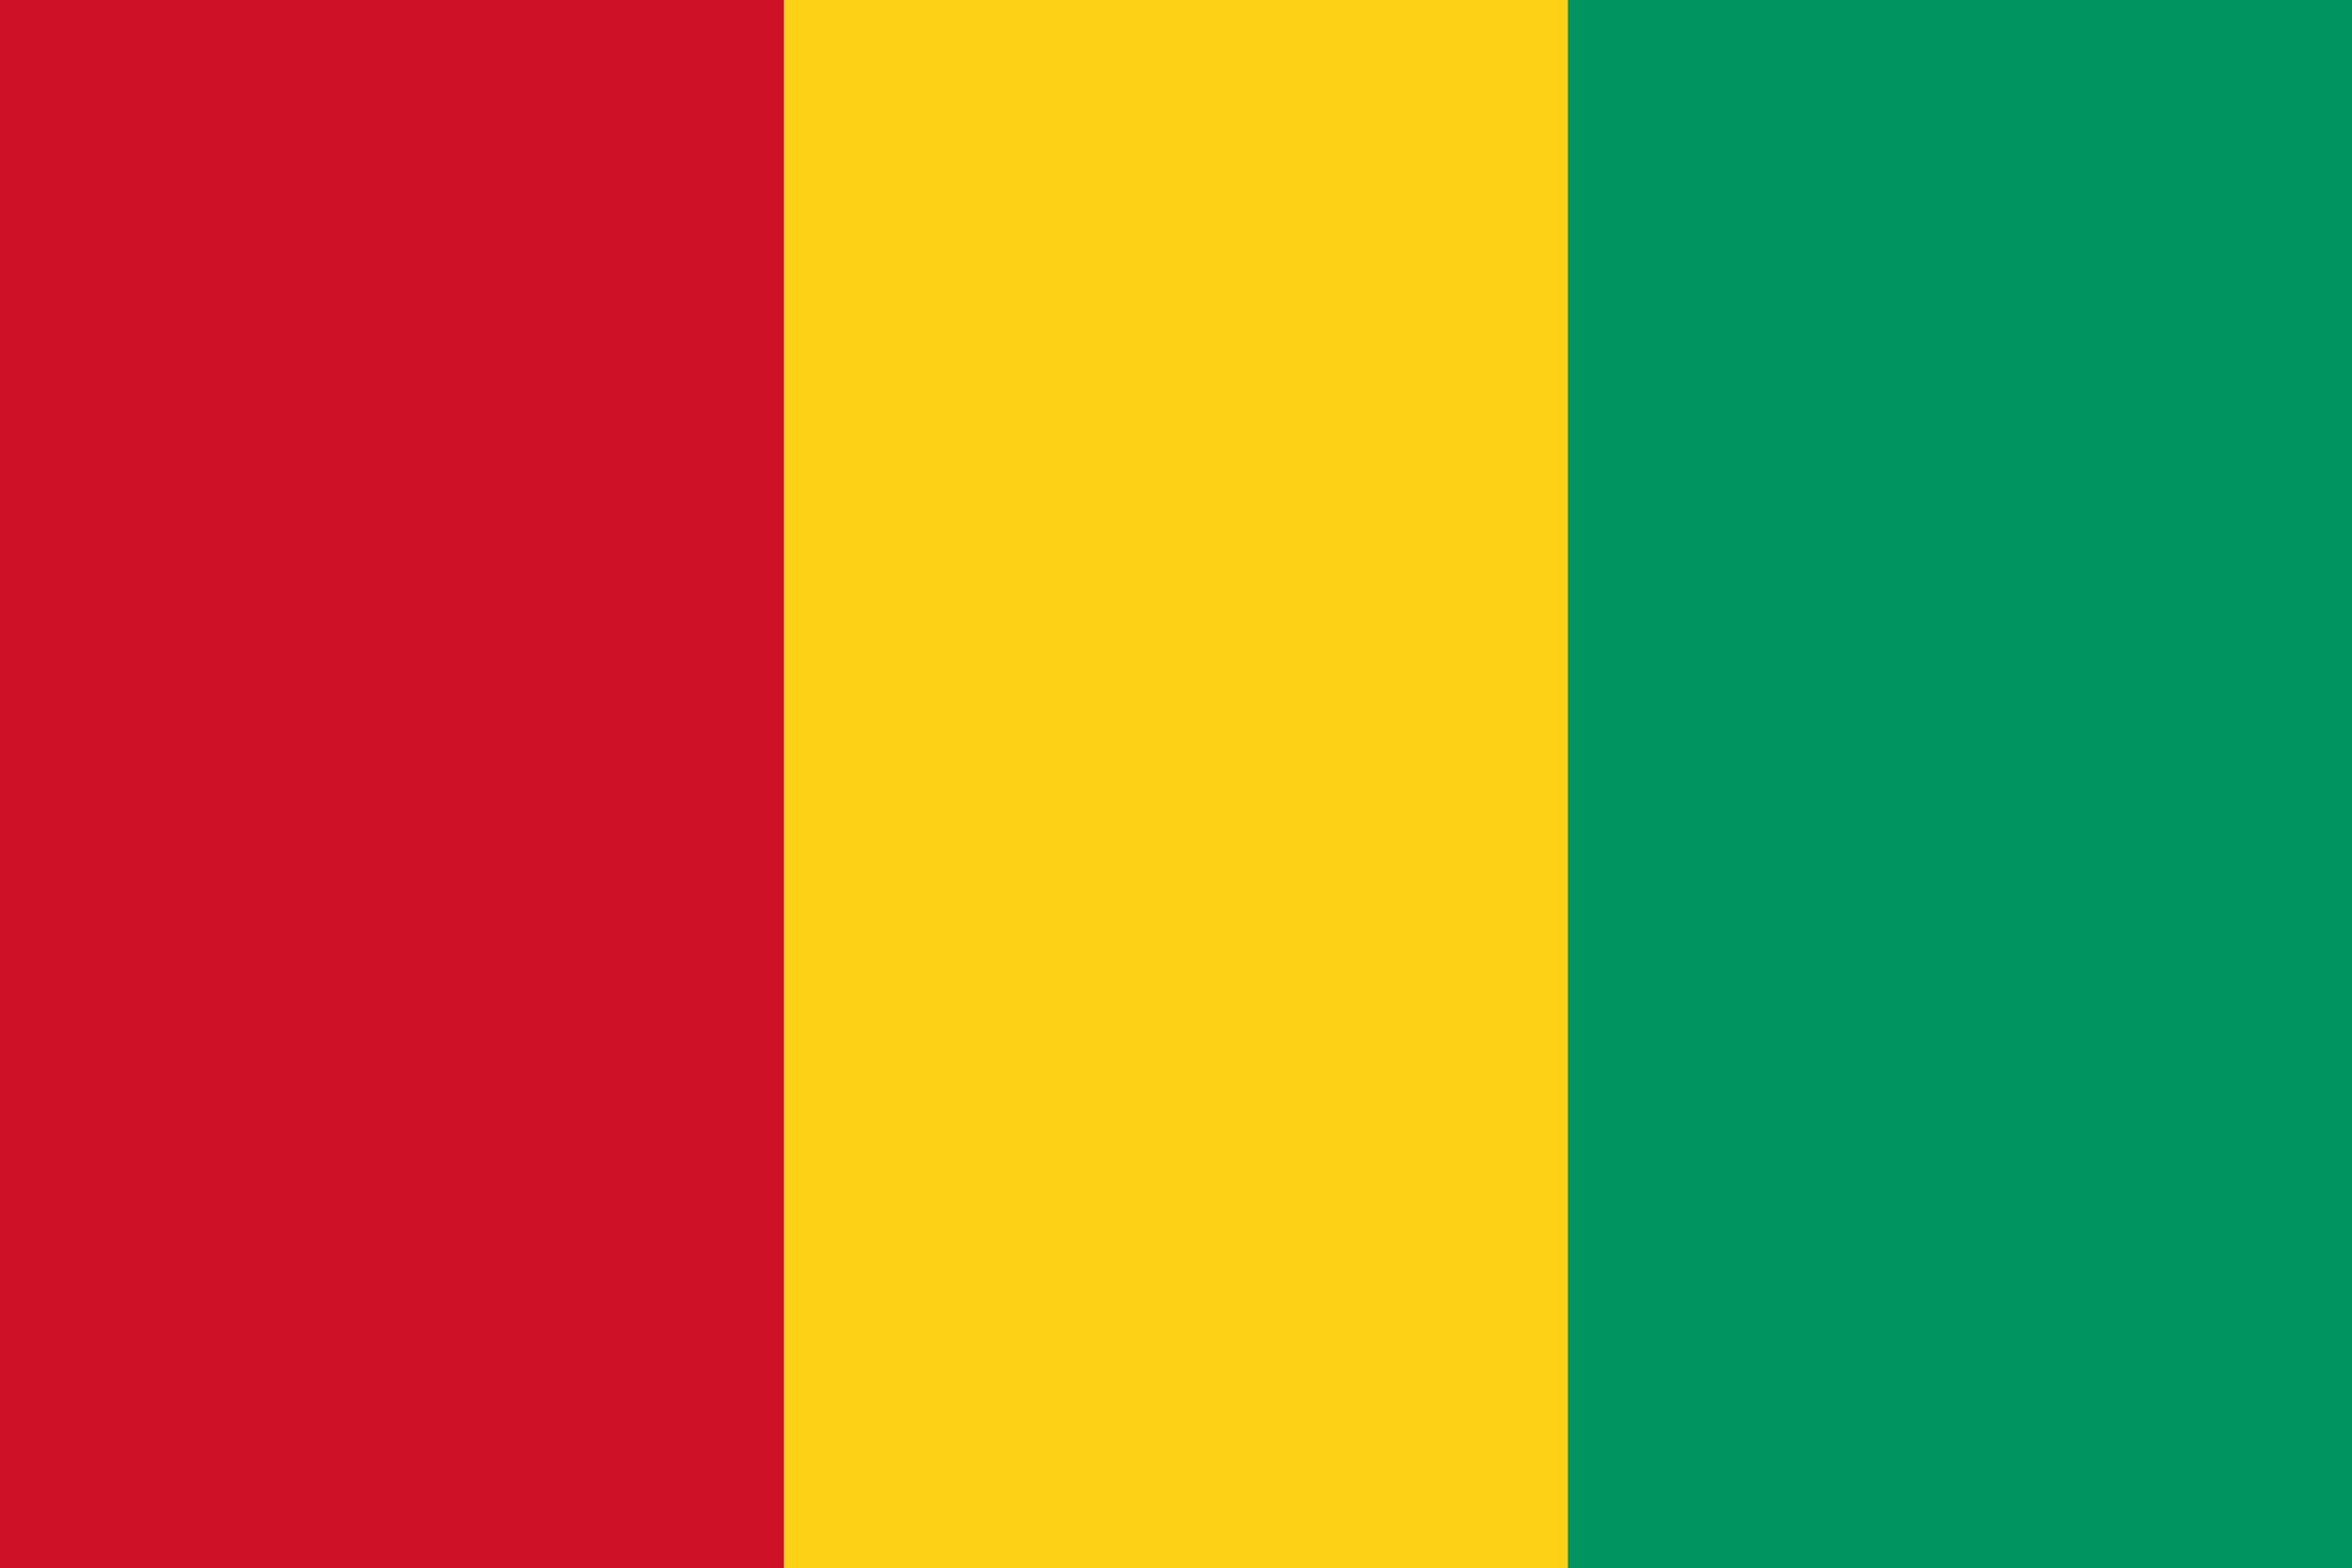 Guinea, paese, emblema, logo, simbolo - Sfondi HD - Professor-falken.com